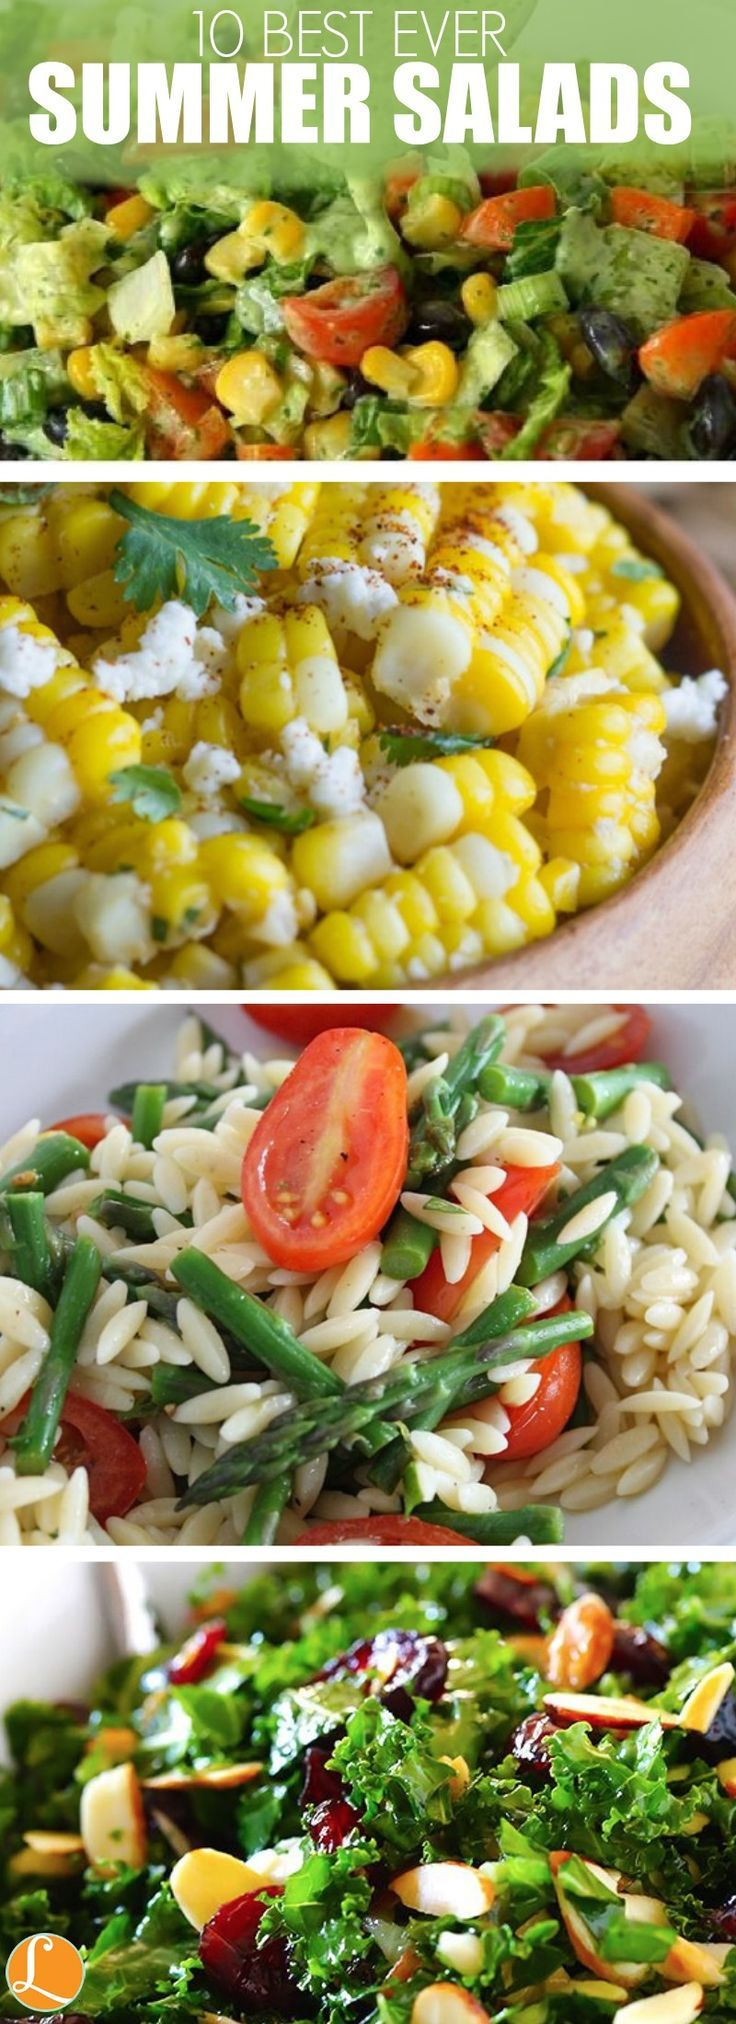 10 Best Ever Summer Salads Recipes